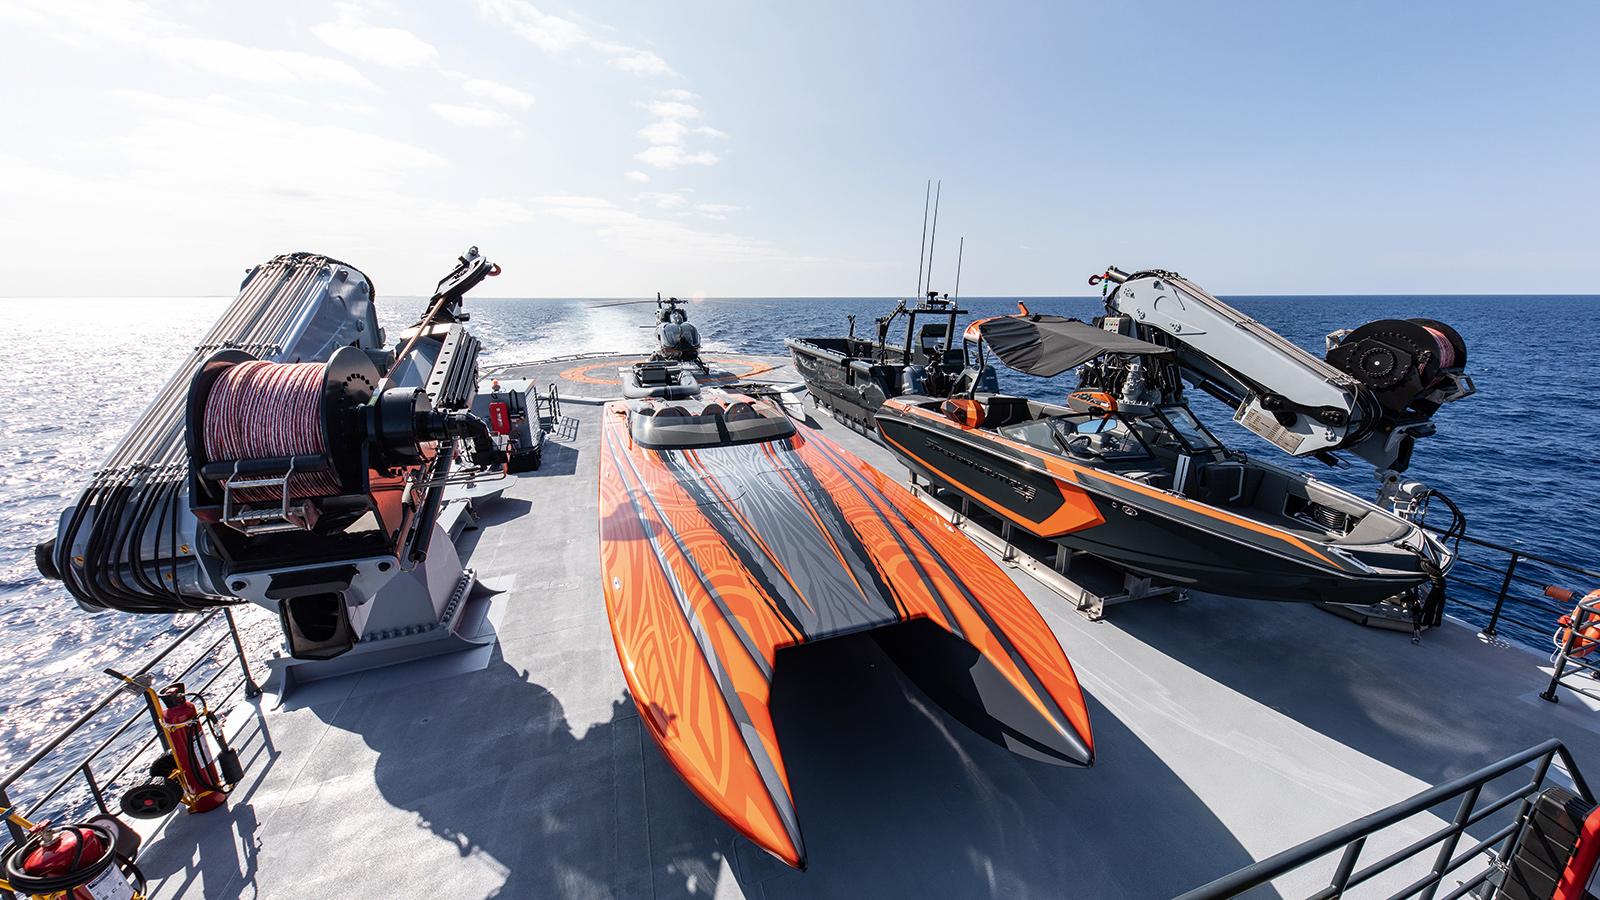 catamaran-superyacht-Hodor-worlds-largest-toybox-tenders